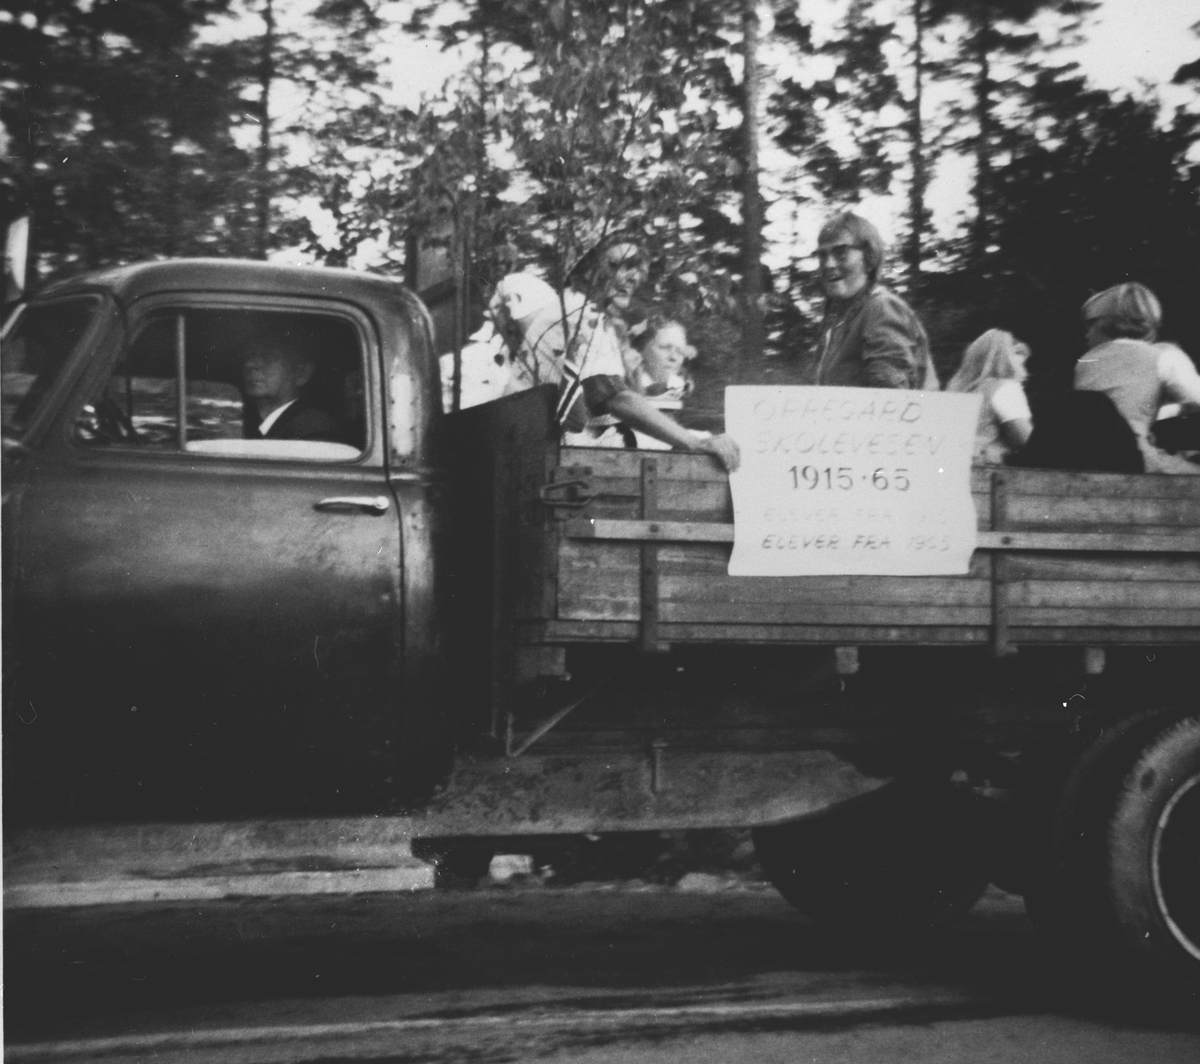 Opptog i forbindelse med Oppegård kommunes 50-års jubileum. Deltakere på et lasteplan.